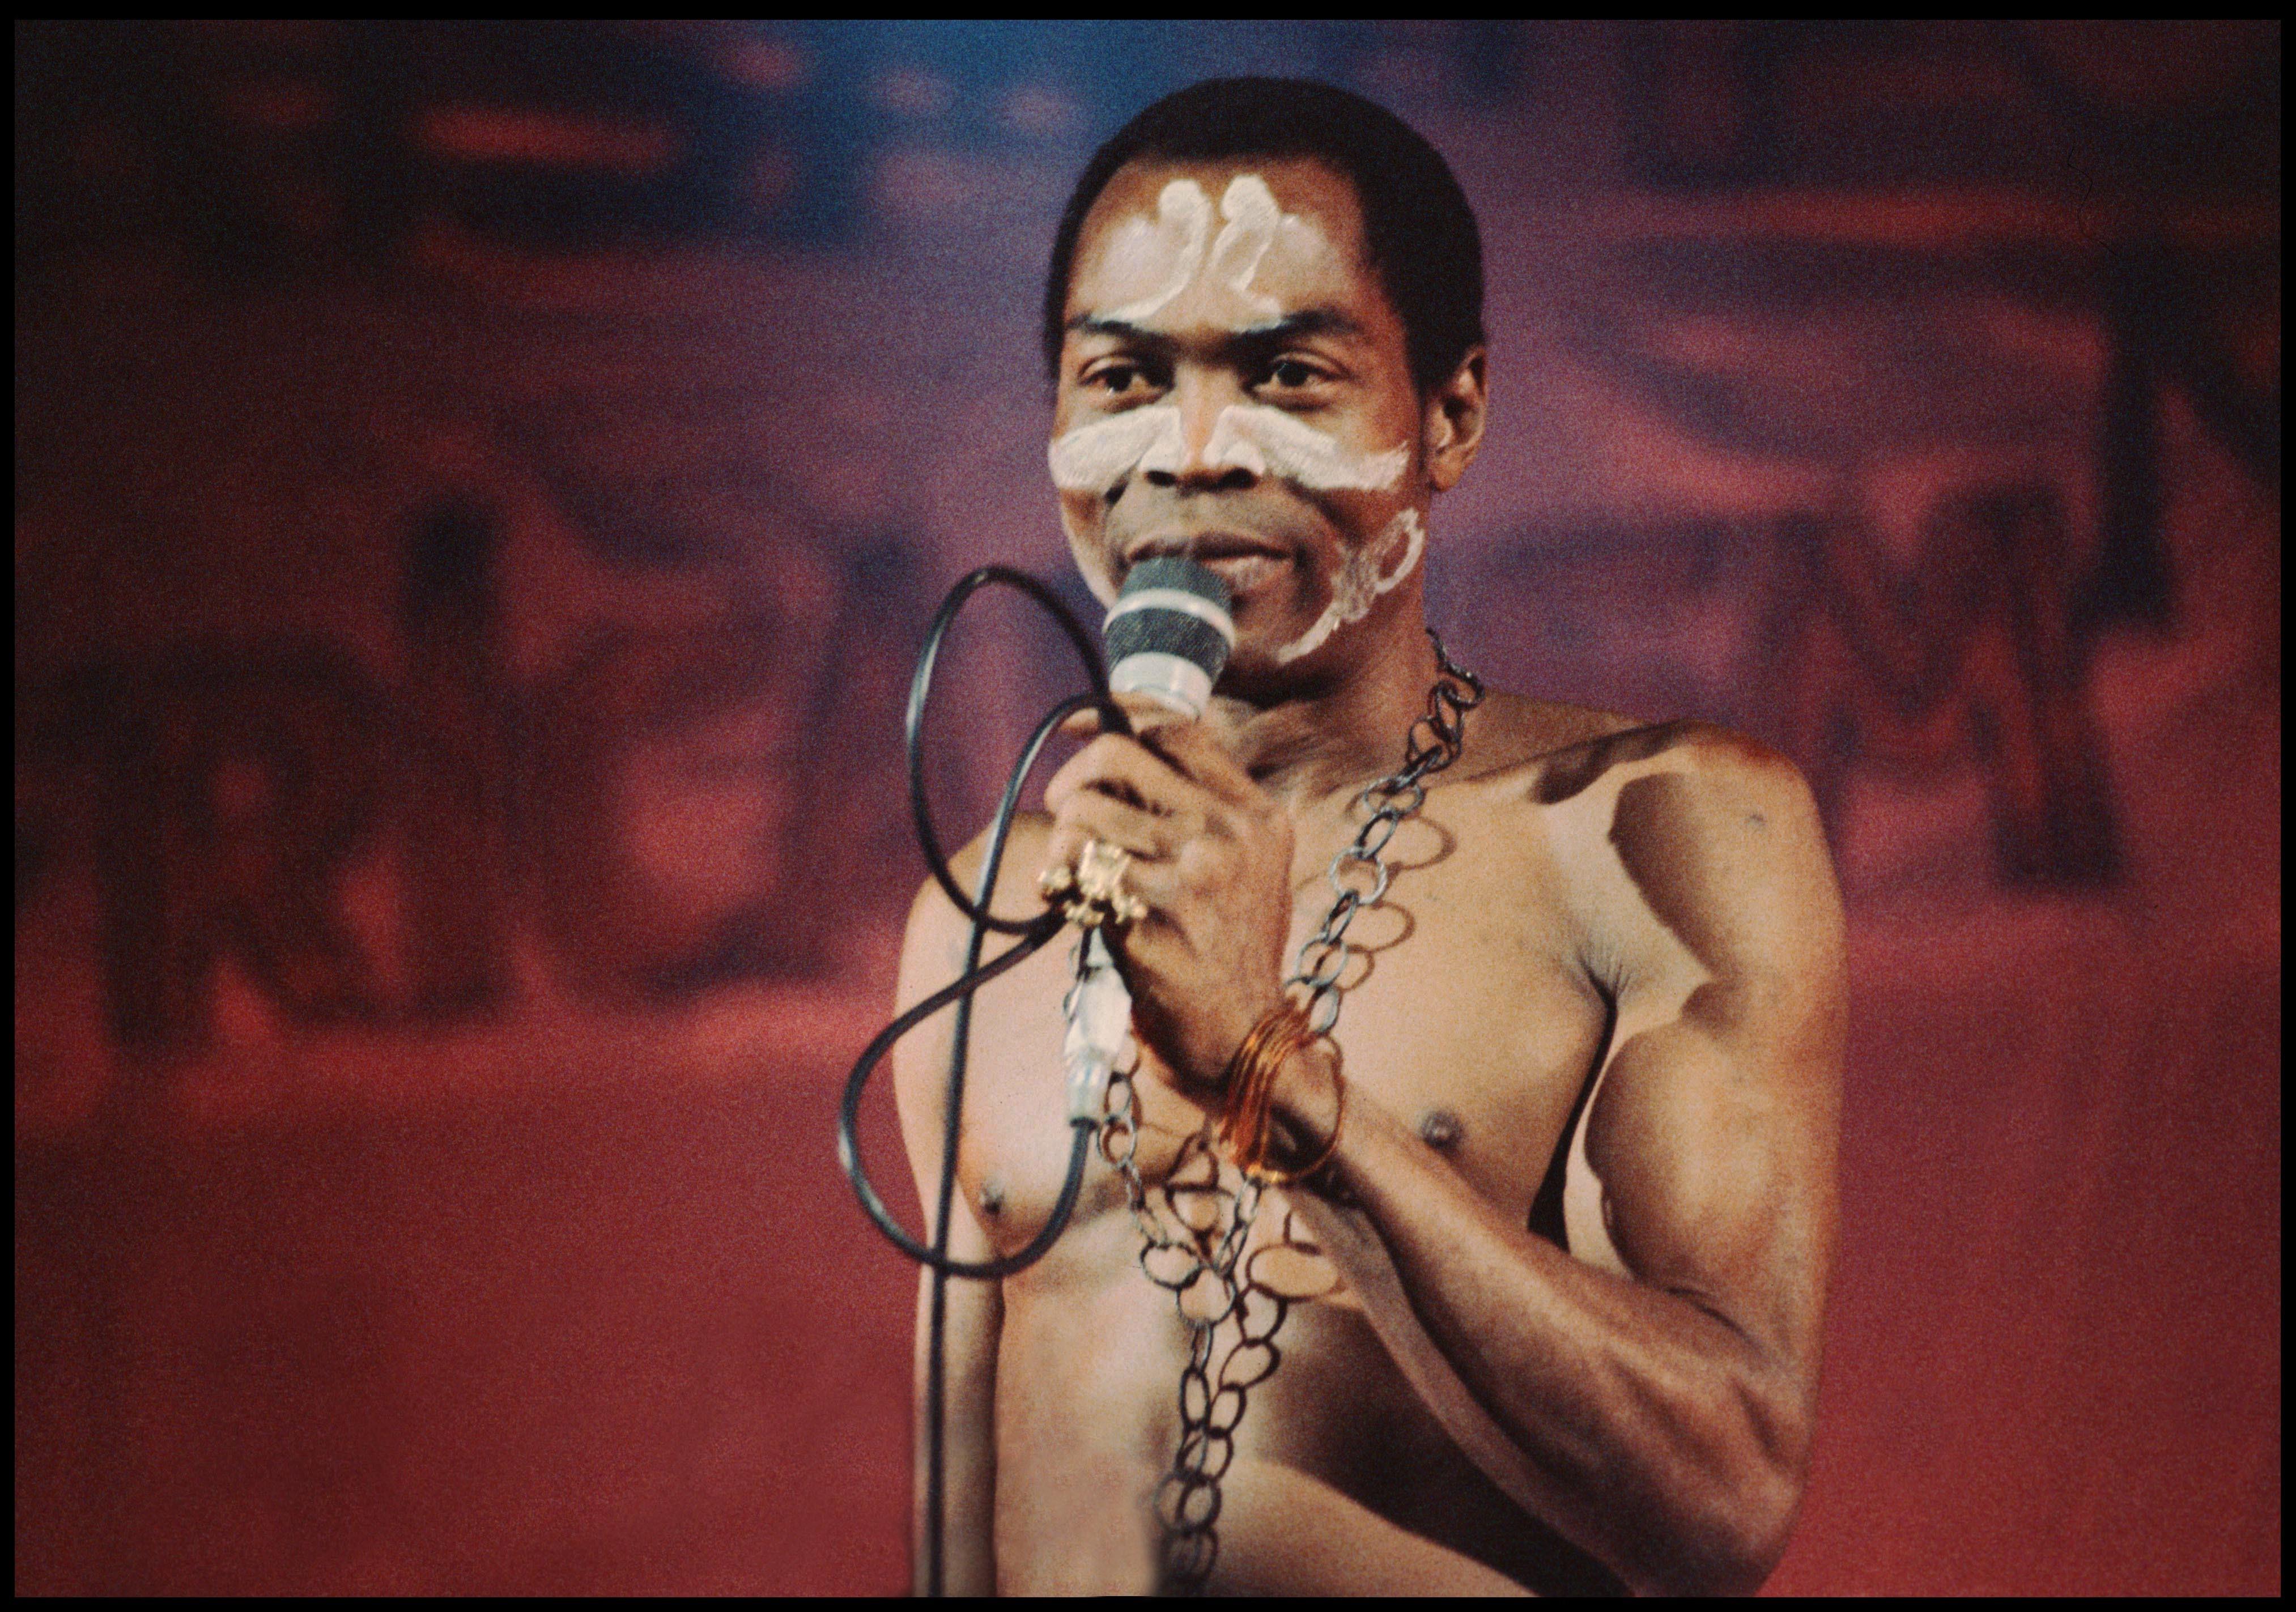 The Legend of Fela Kuti